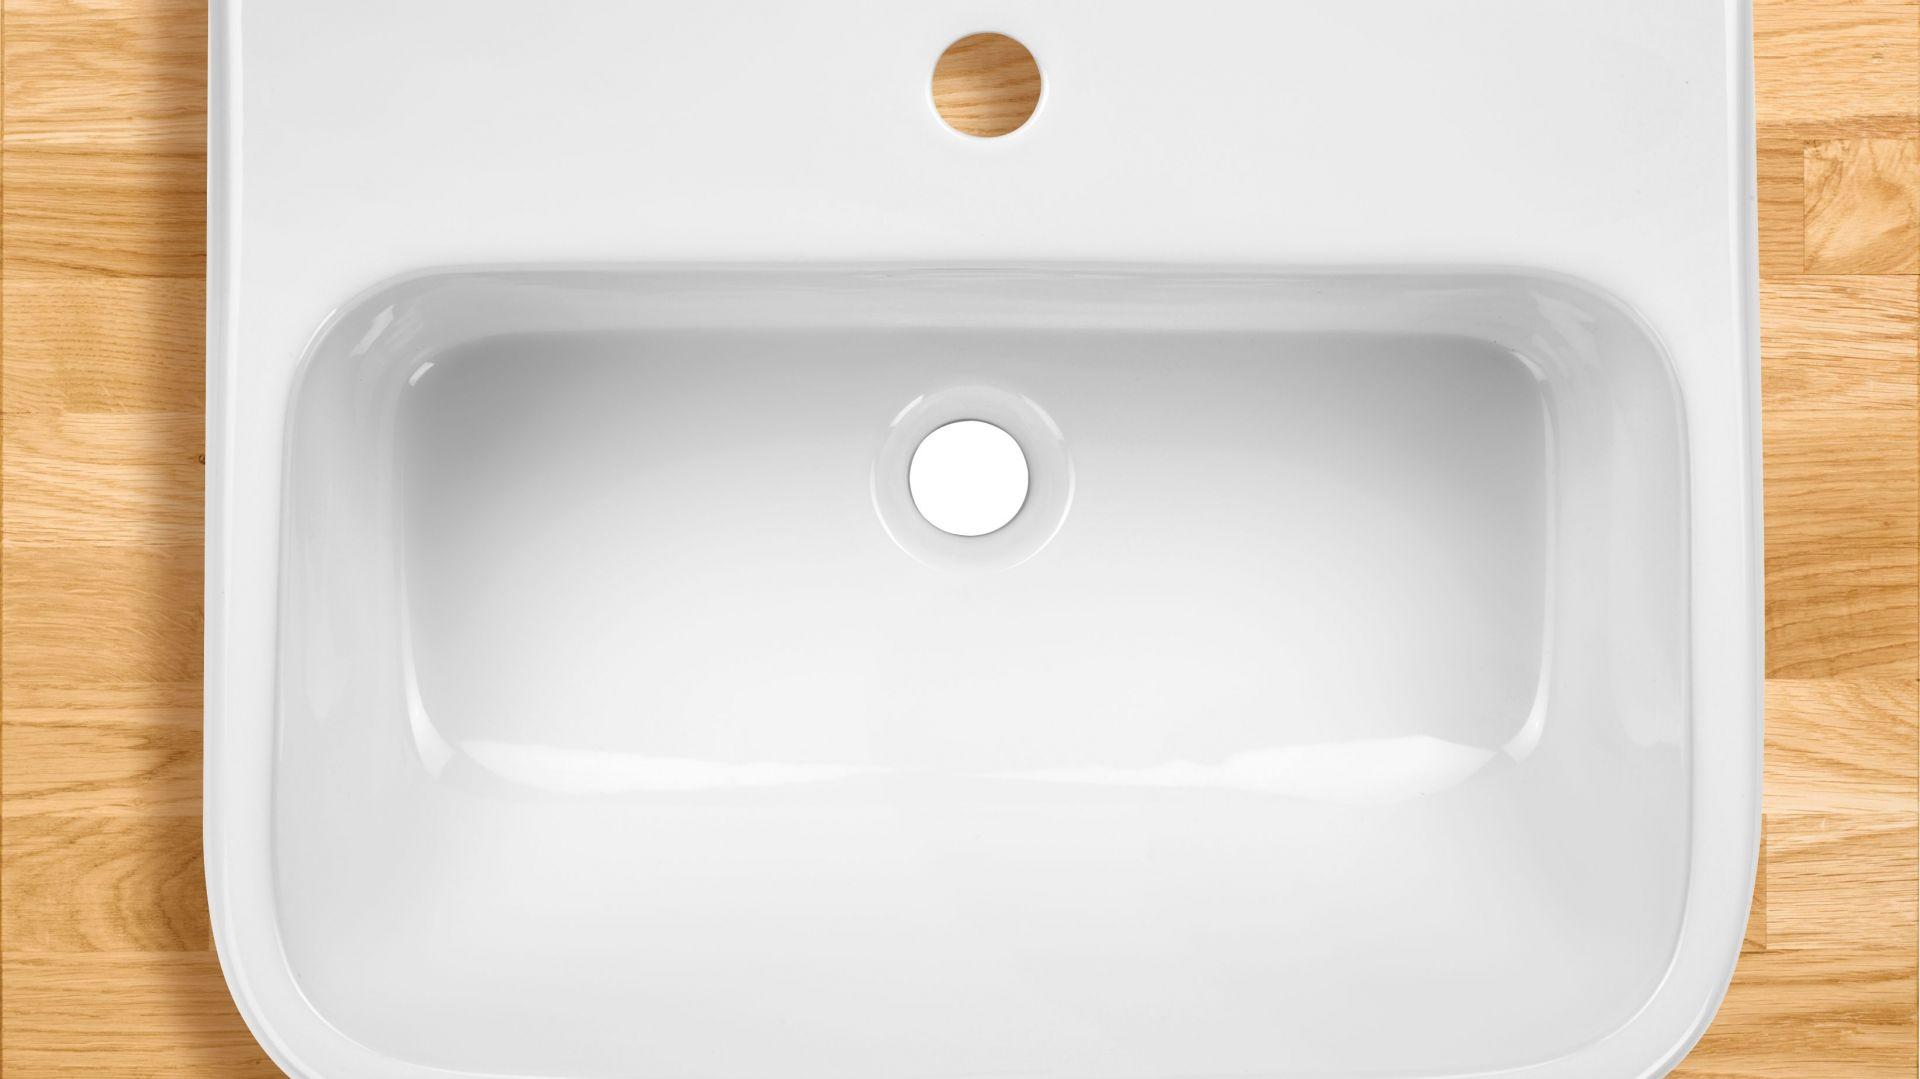 Umywalka wisząca z kolekcji Hiacynt. Fot. Deante